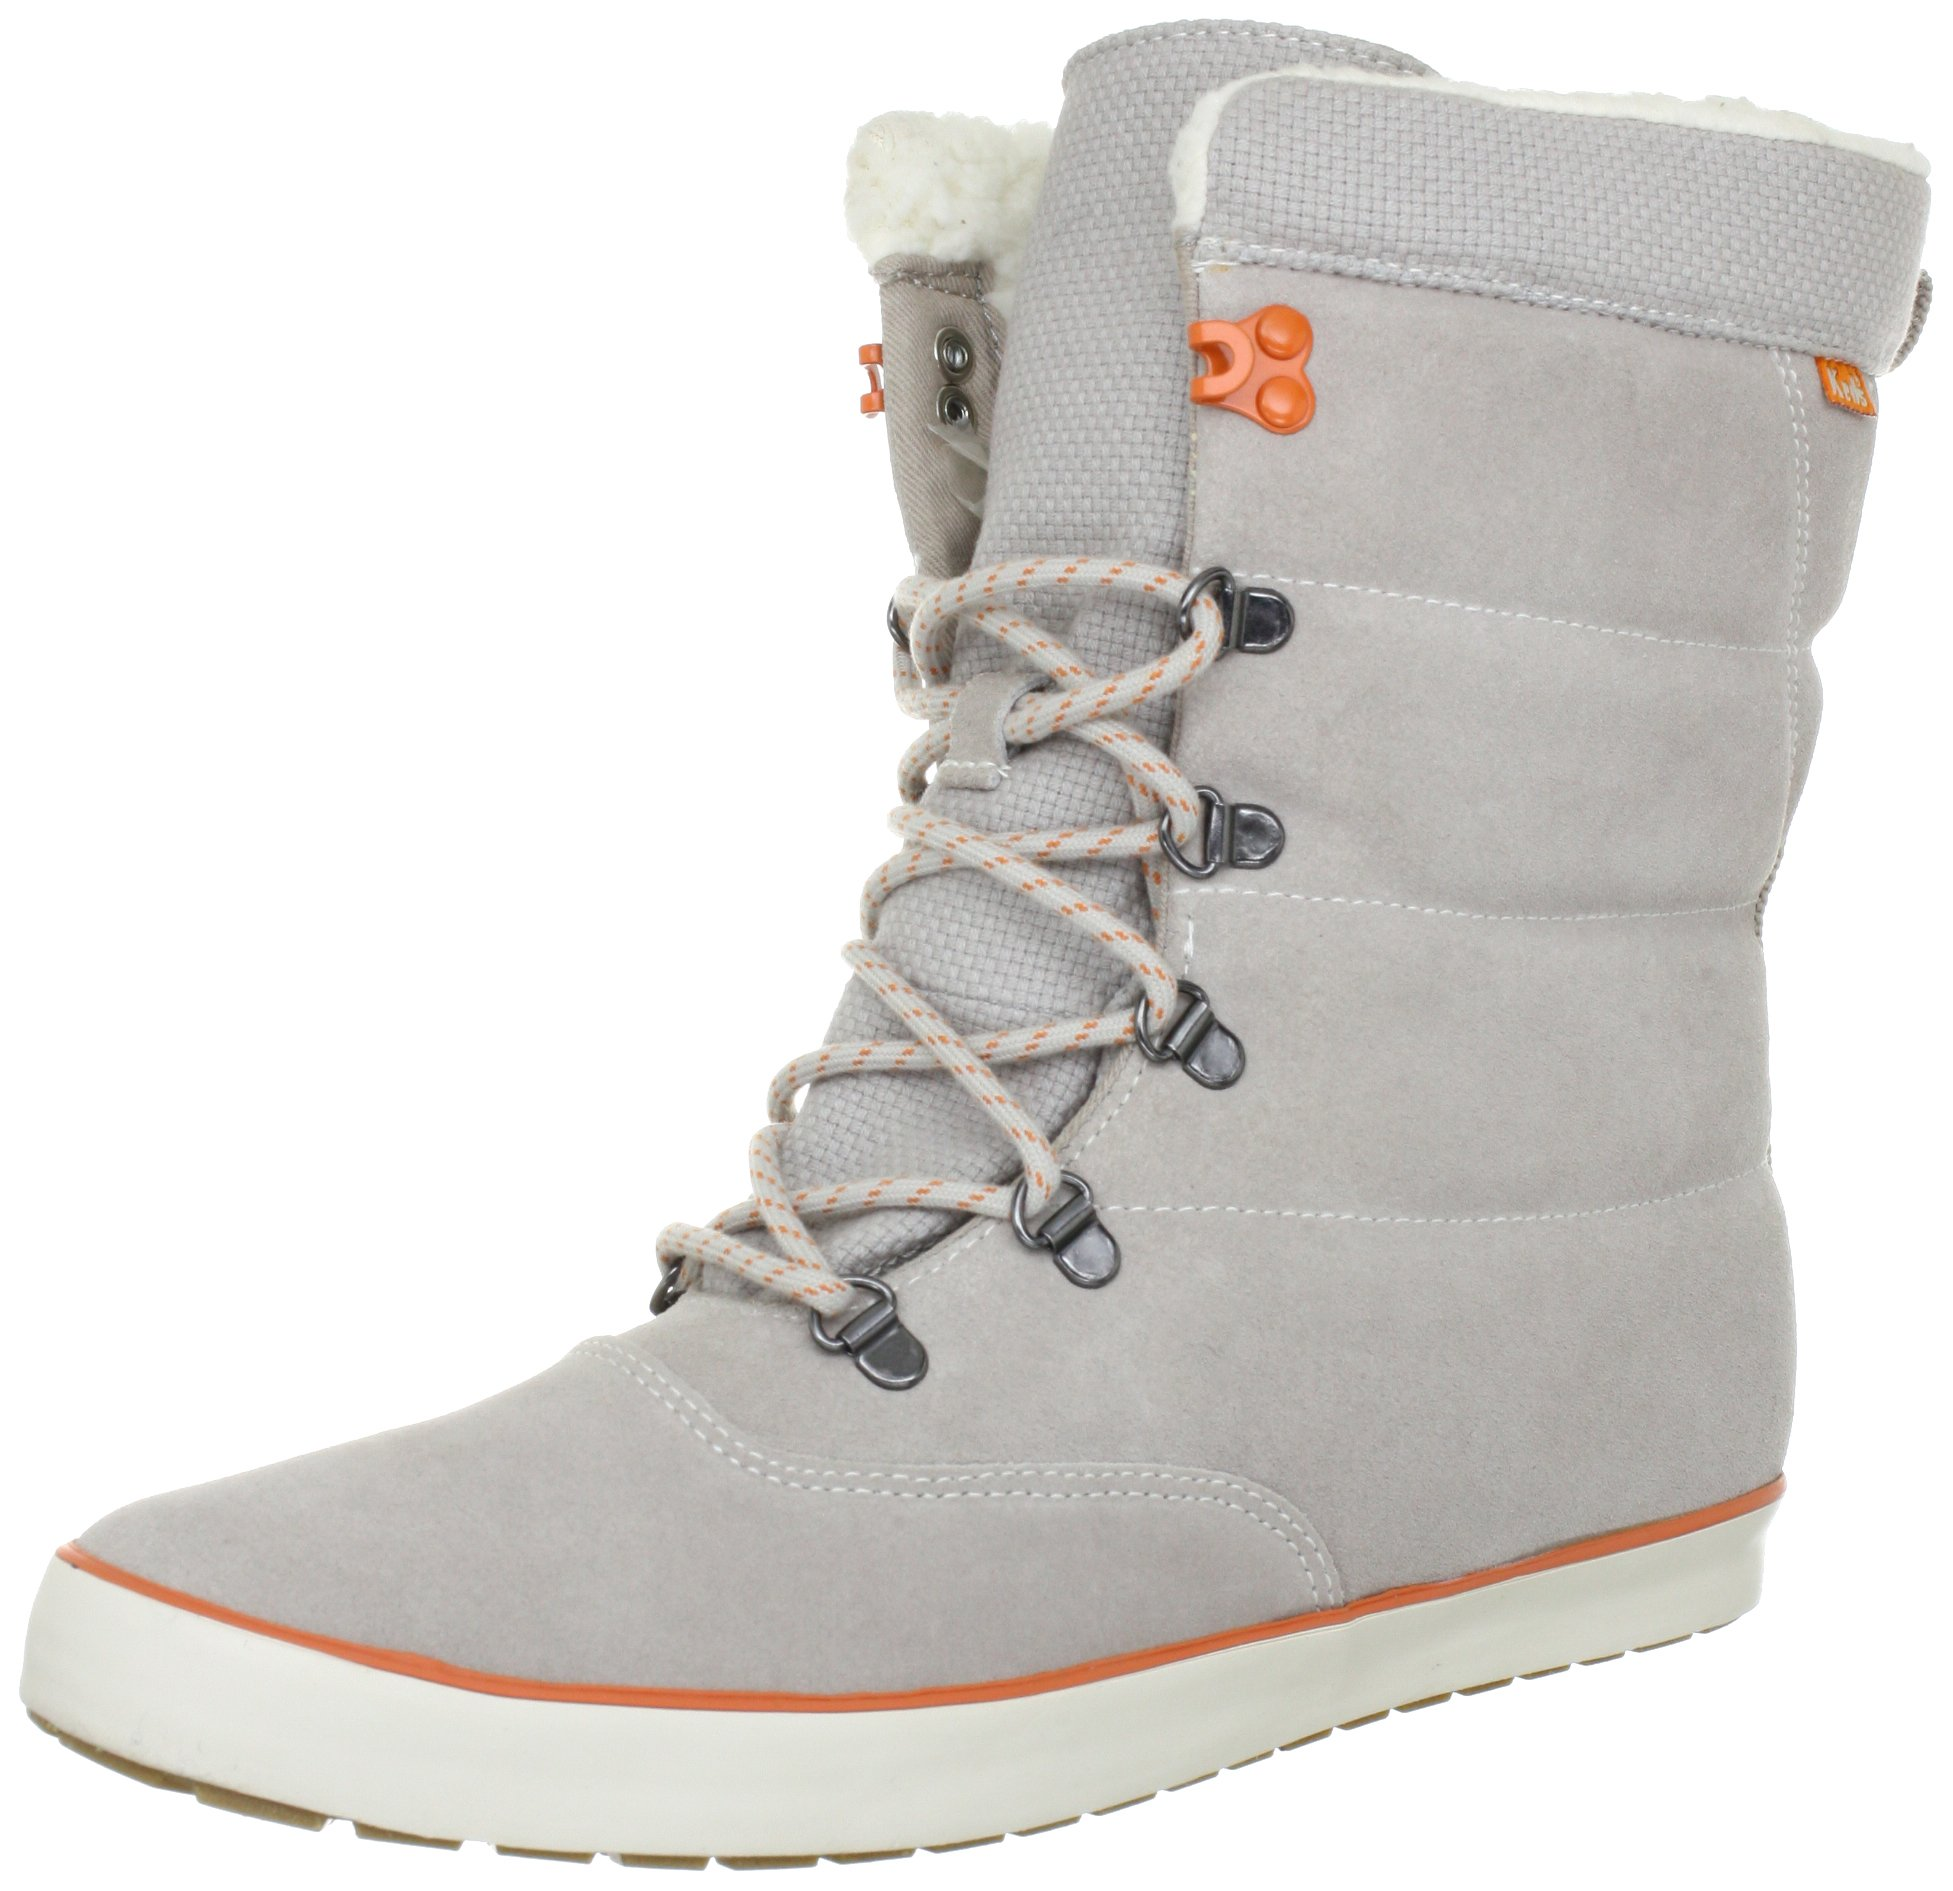 Keds Leather Boot Cream Puff Eu Wh45084Boots FemmeGrisegris37 76IYbvgfy